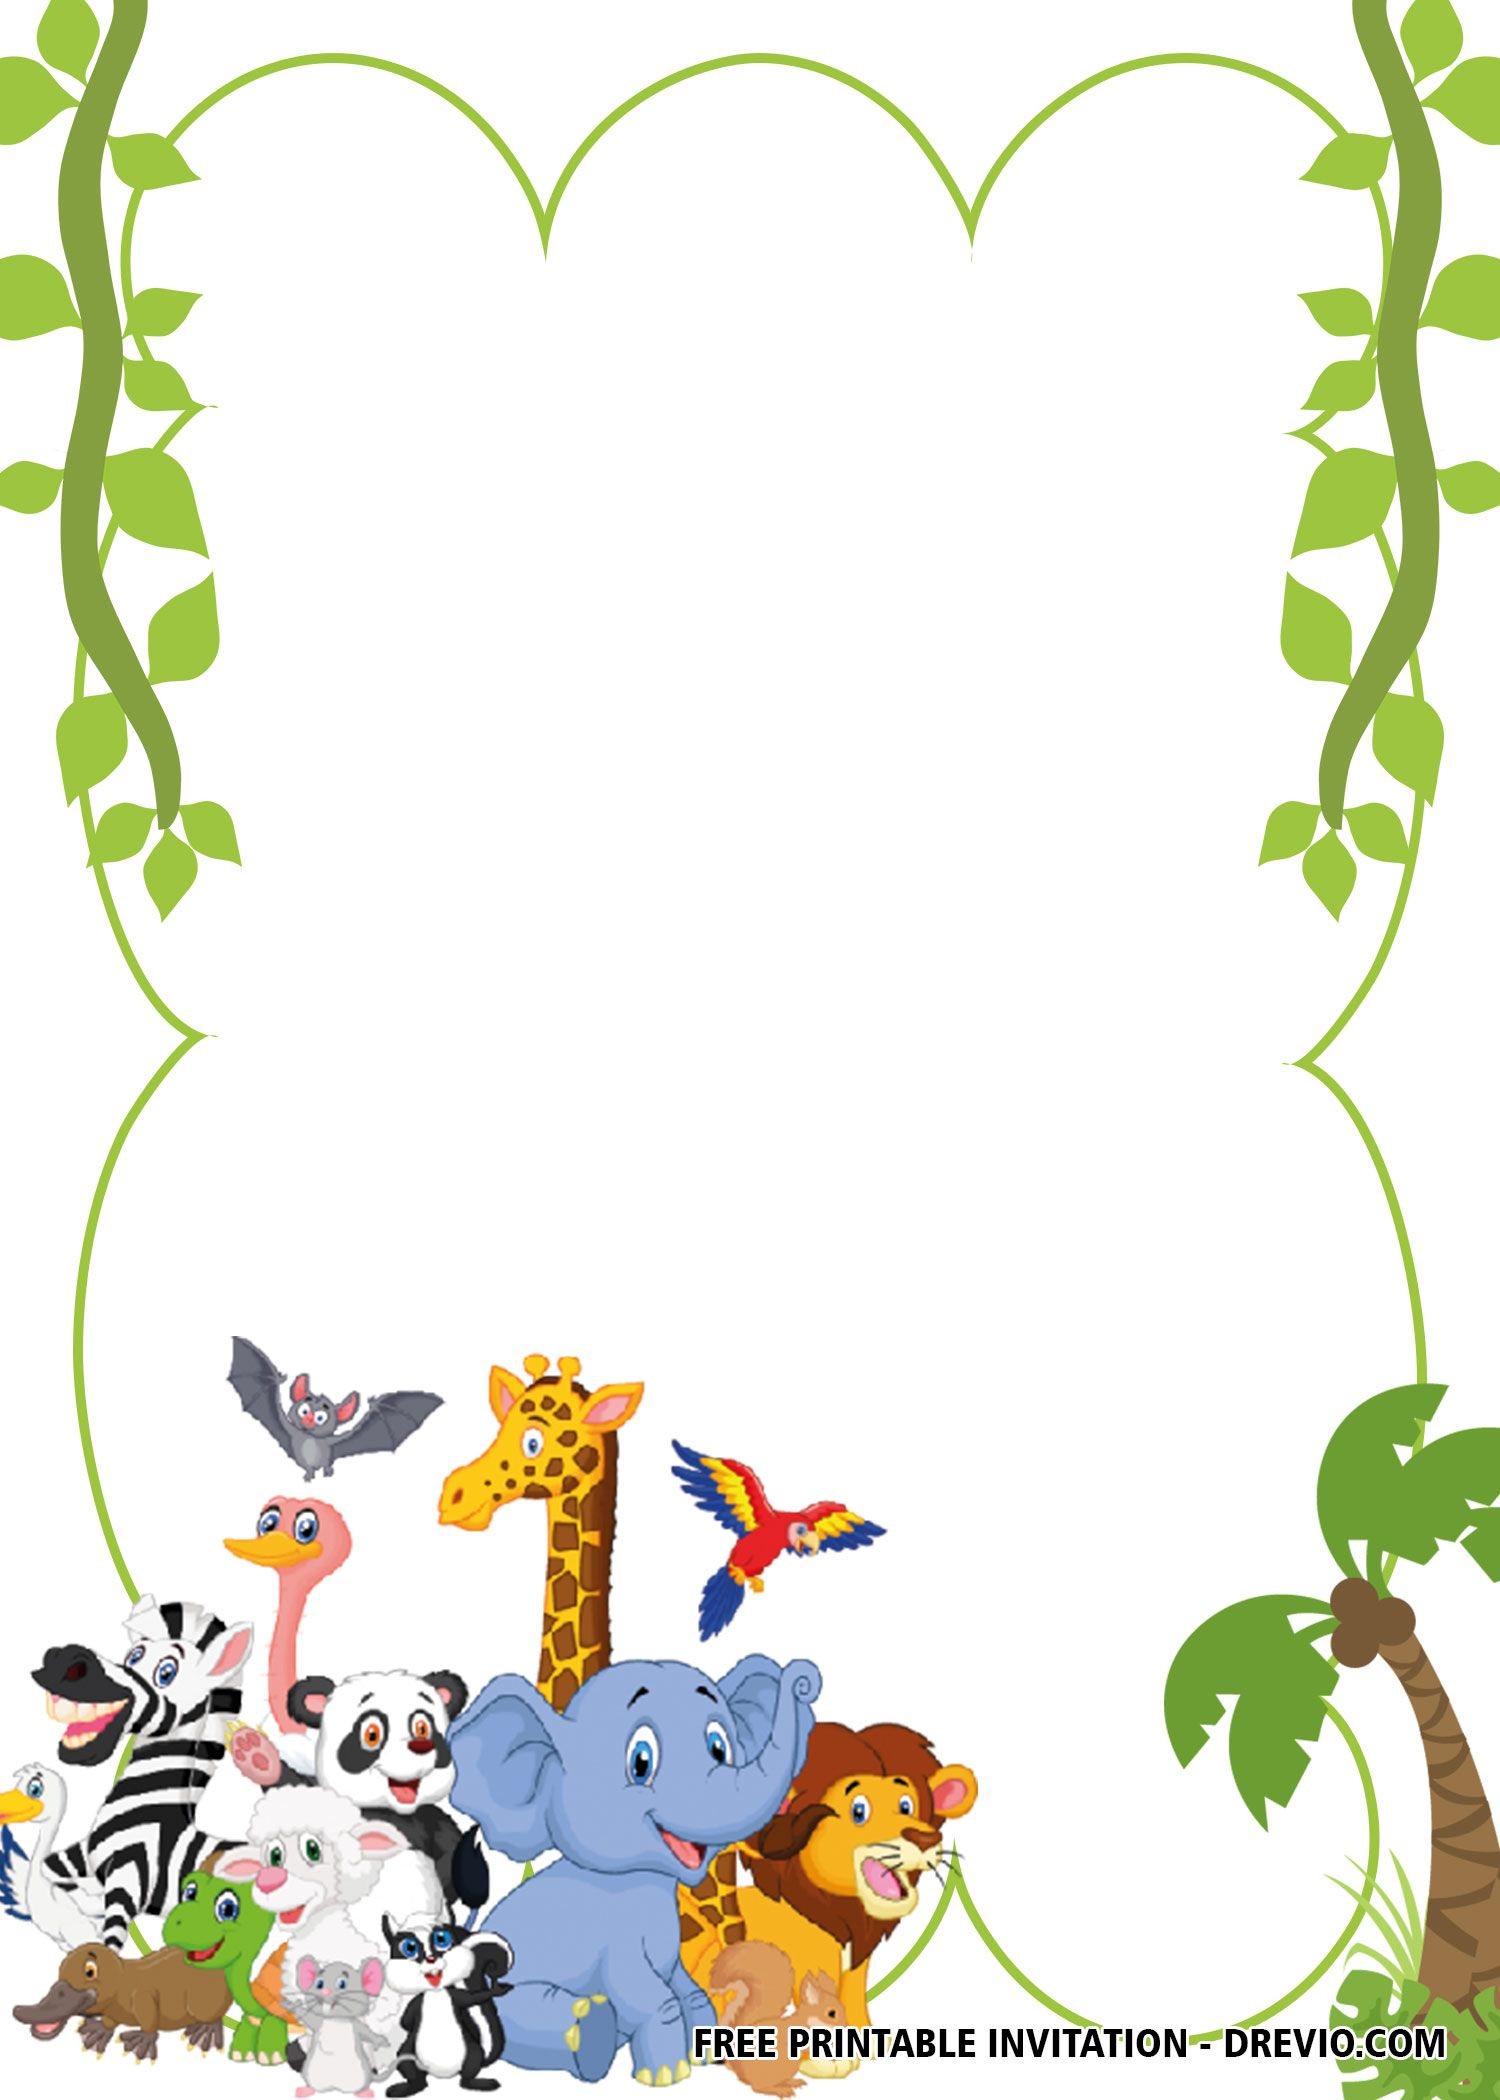 FREE Printable Wild Safari Invitation Templates  DREVIO  Safari